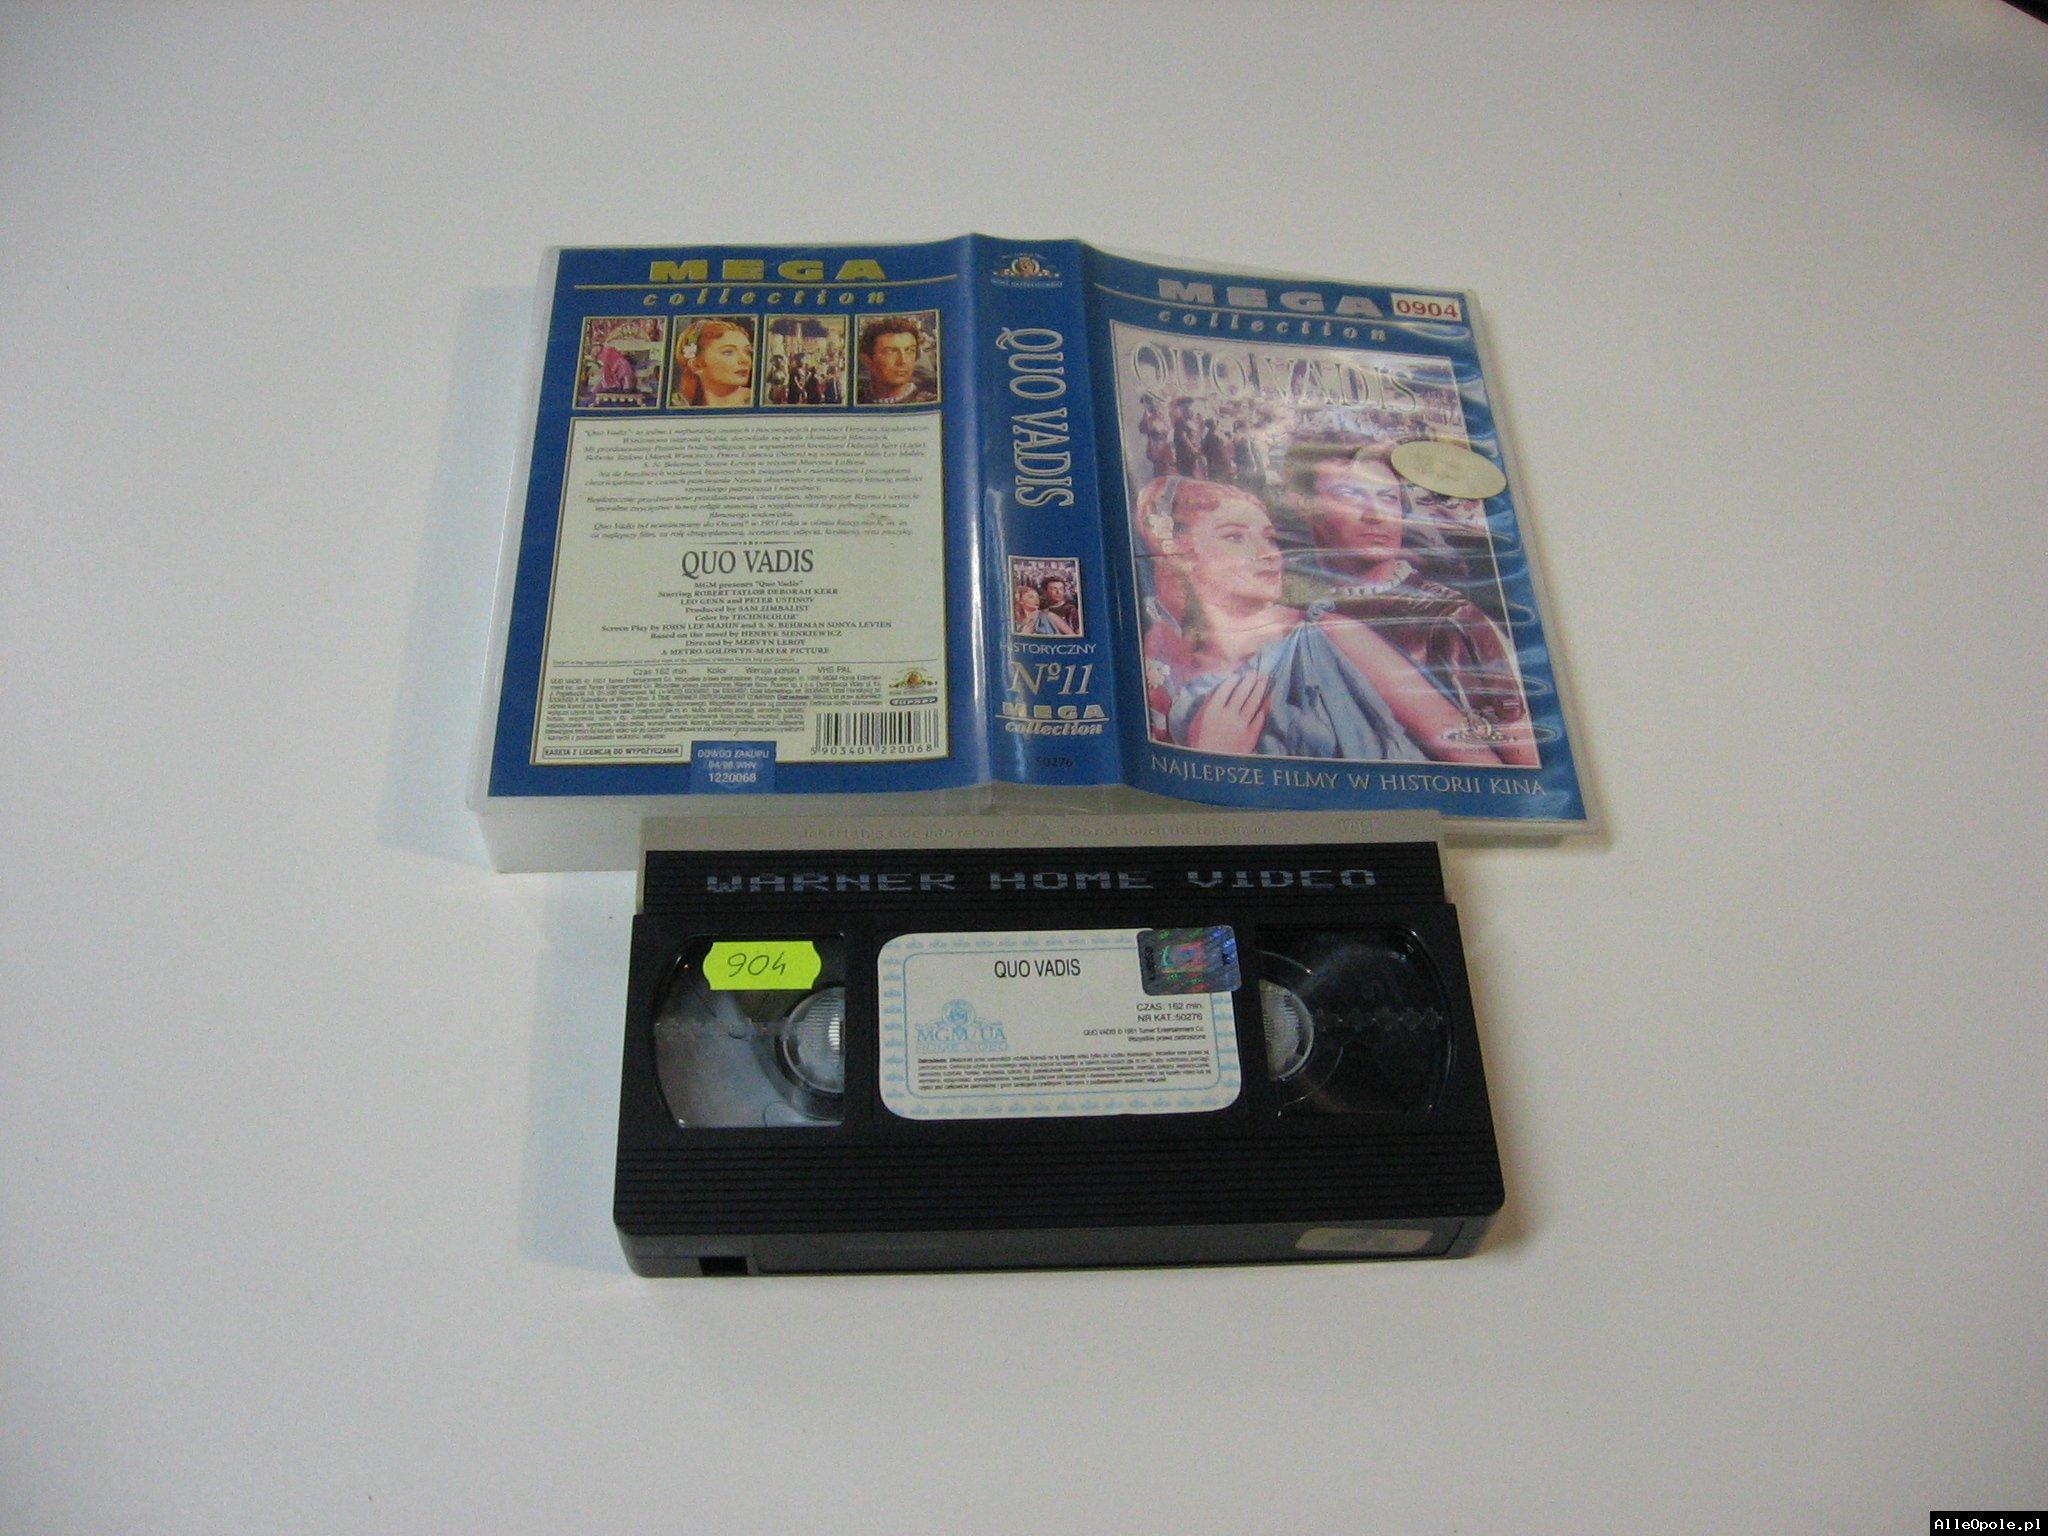 QUO VADIS - VHS Kaseta Video - Opole 1765